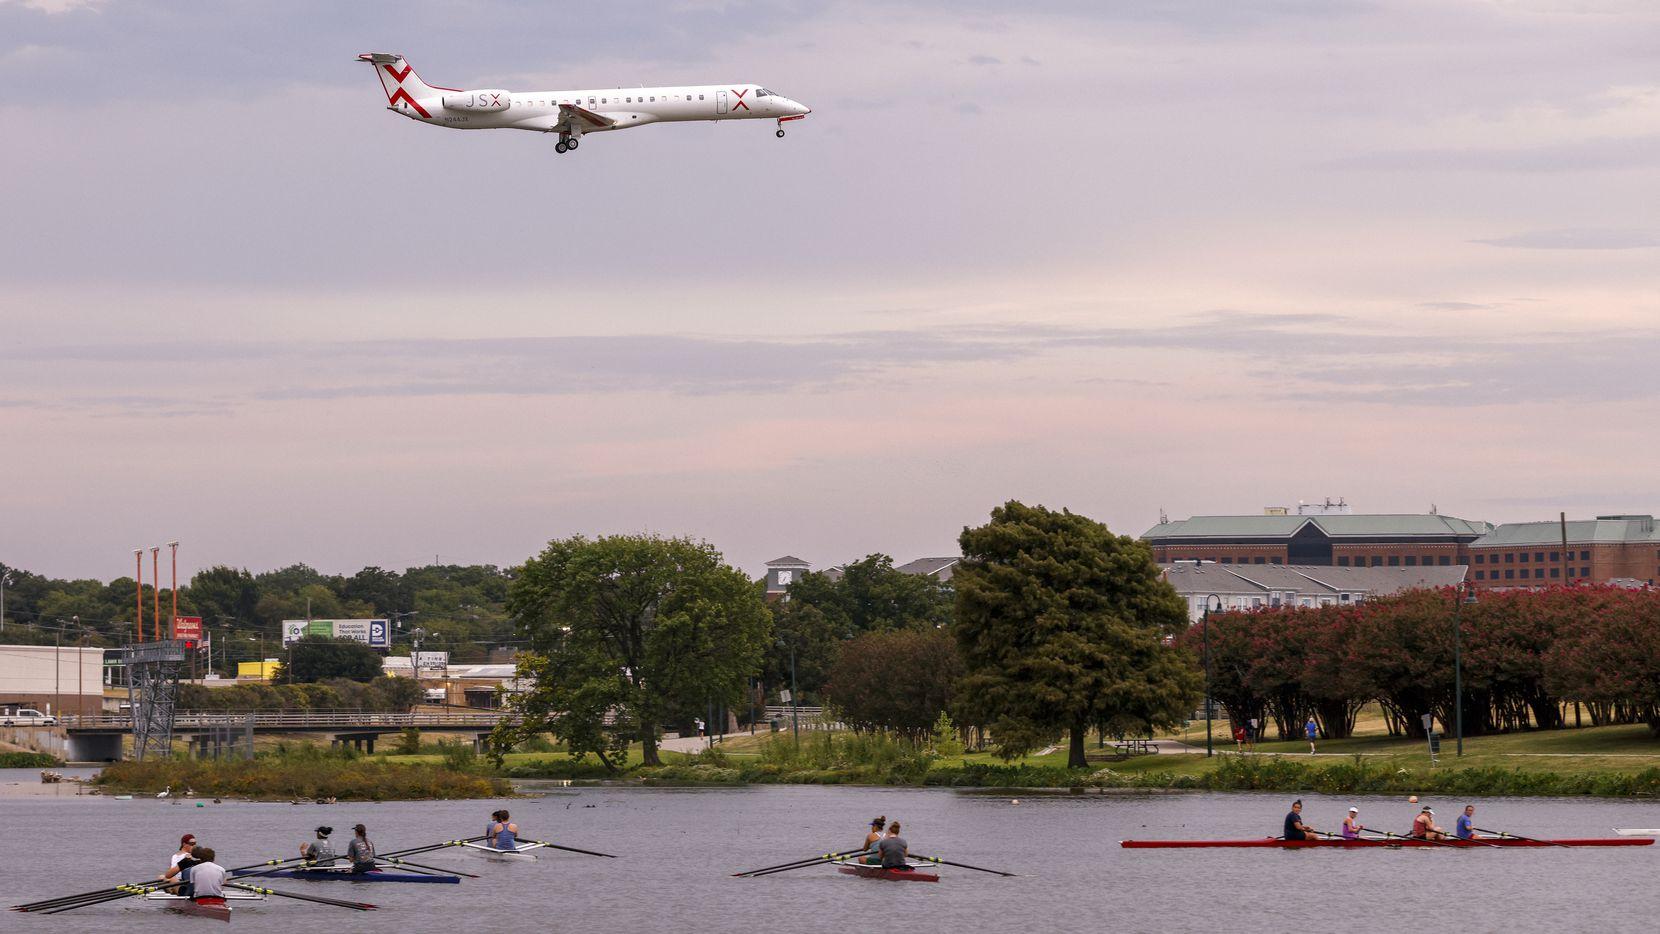 A JSX jet flies over Bachman Lake as it prepares to land at Dallas Love Field.